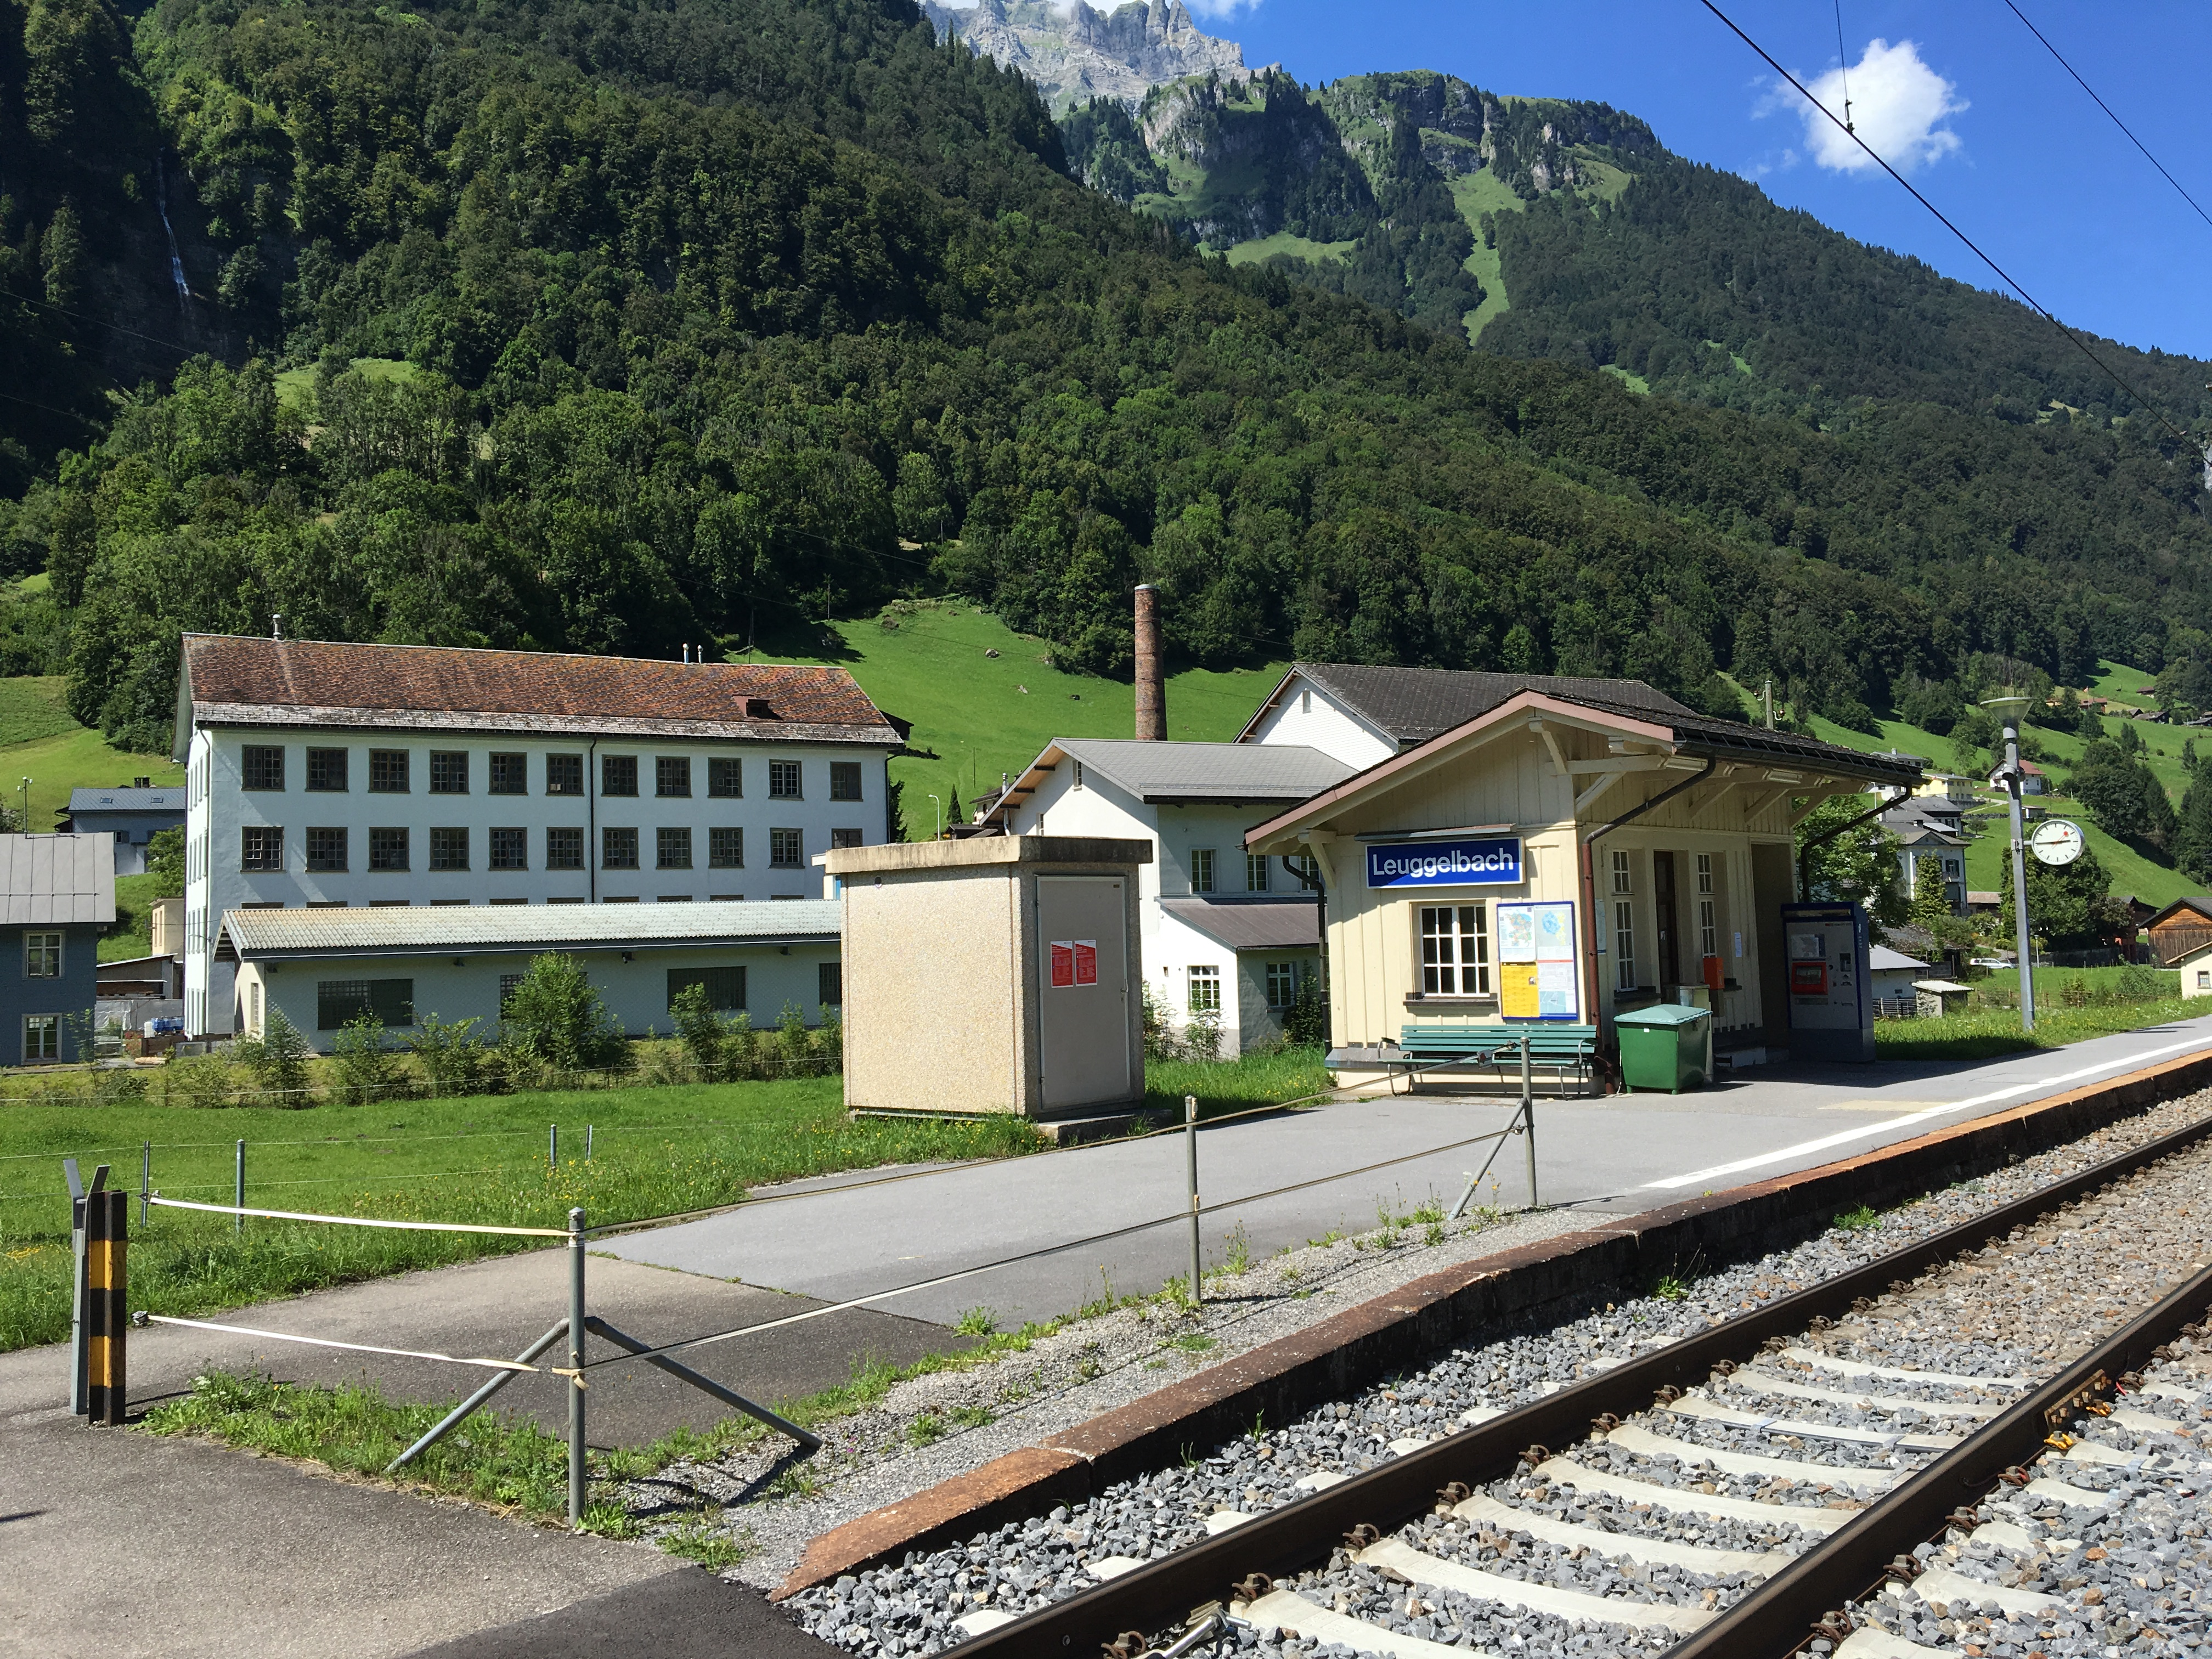 Leuggelbach Railway Station